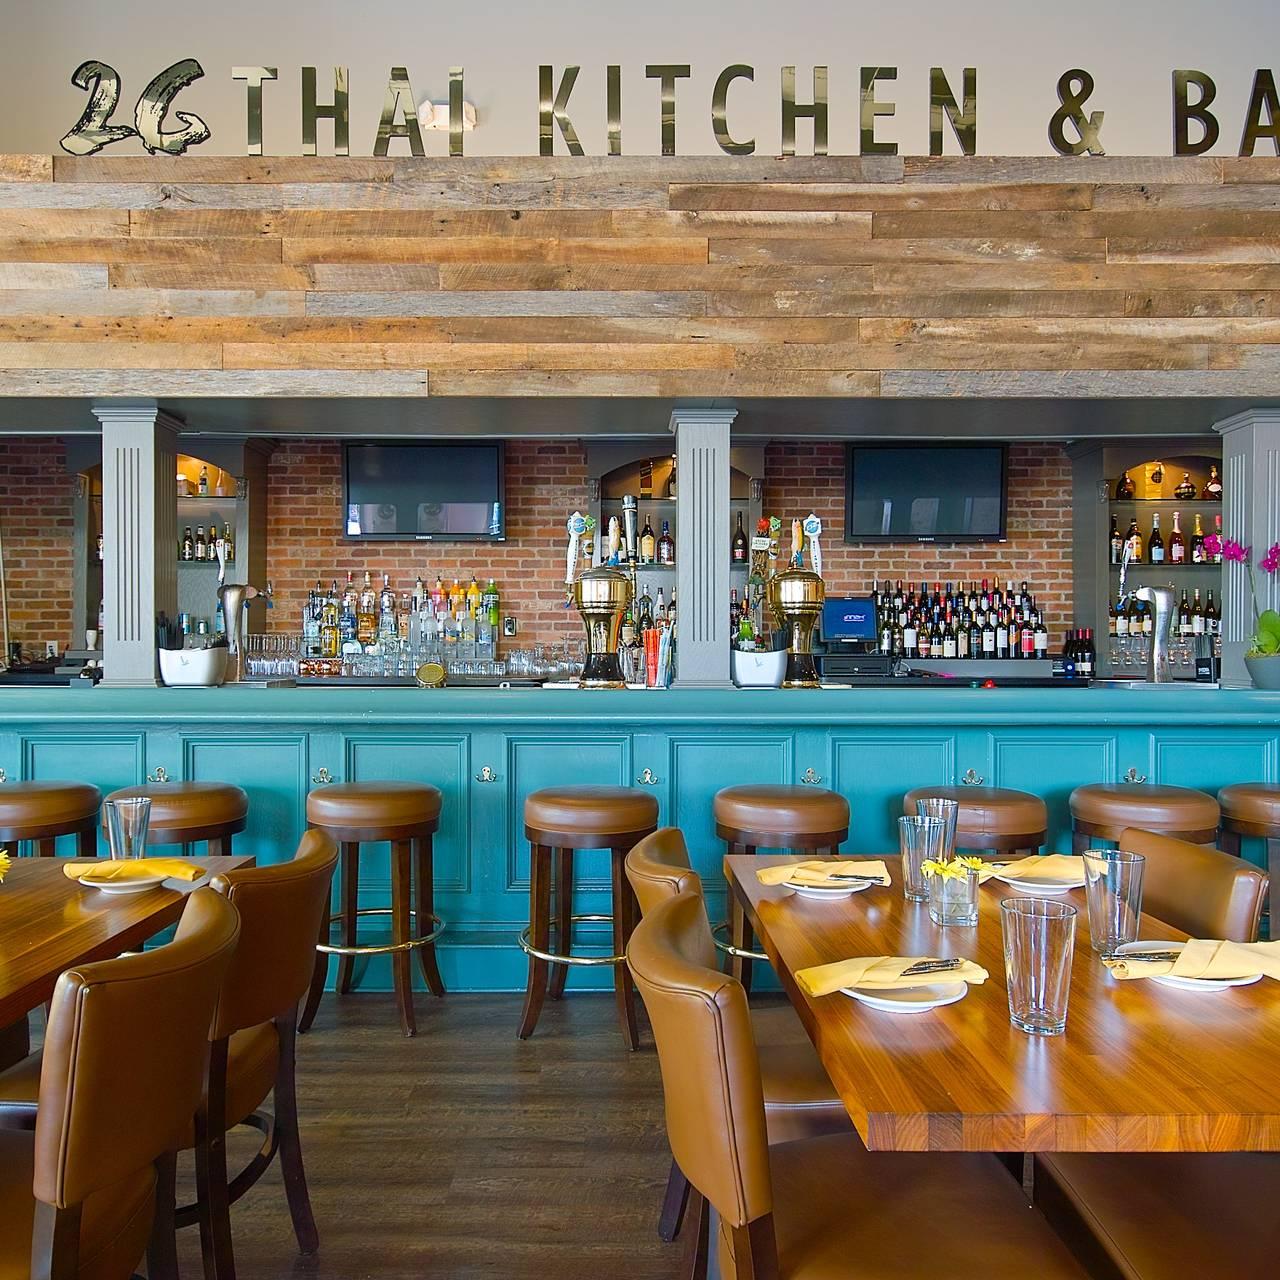 26 Thai Kitchen & Bar Restaurant - Atlanta, GA | OpenTable